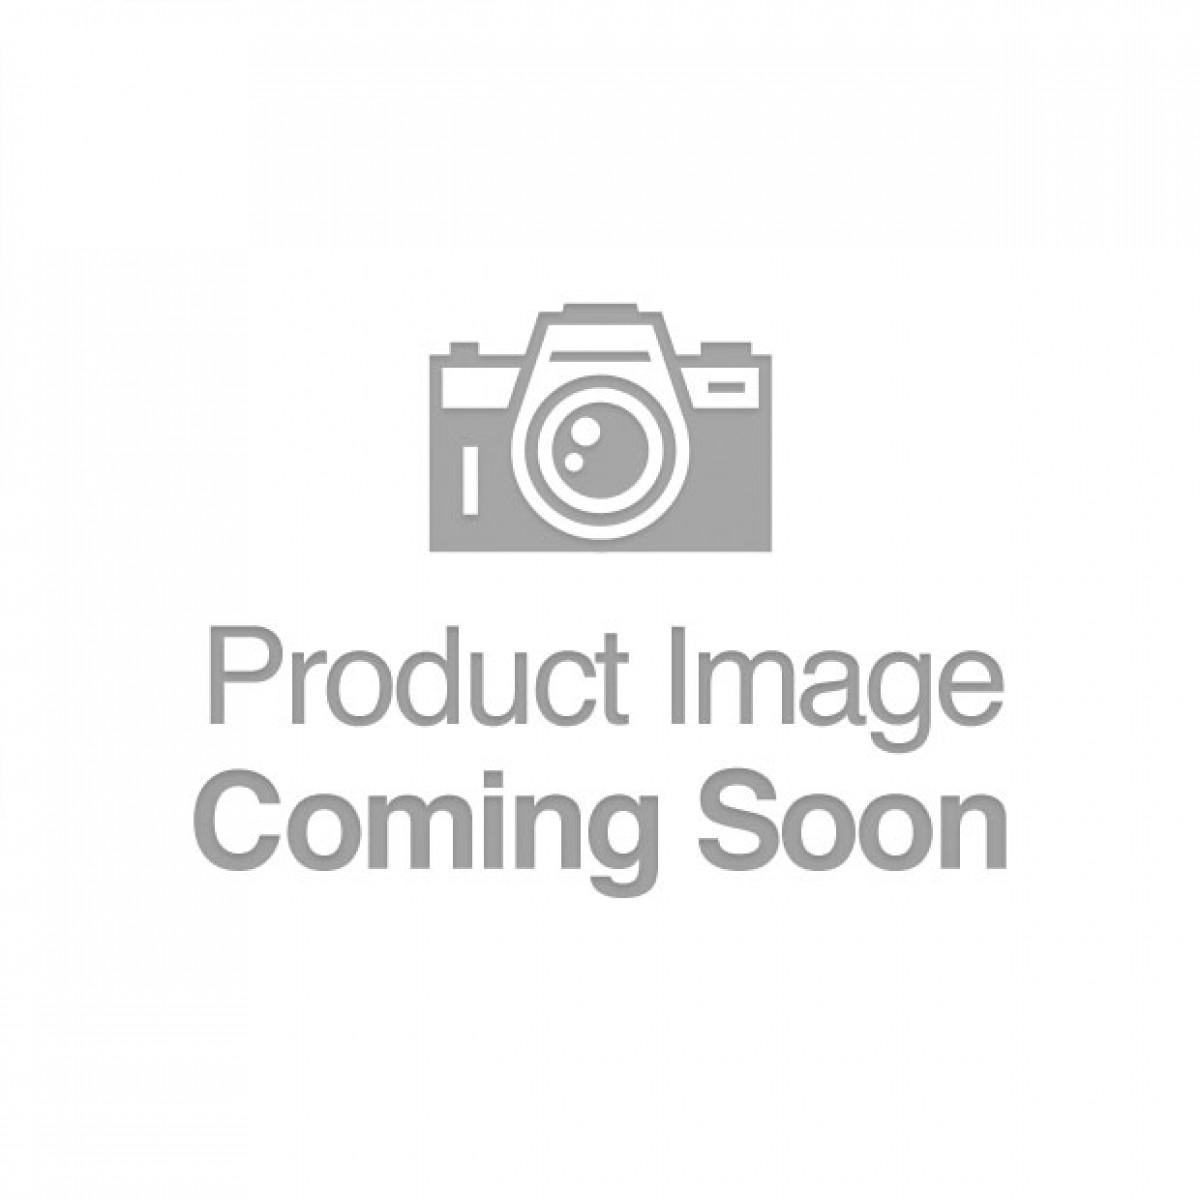 Alpha Pro 7x P-Milker Prostate Stimulator w/Milking Bead - Black